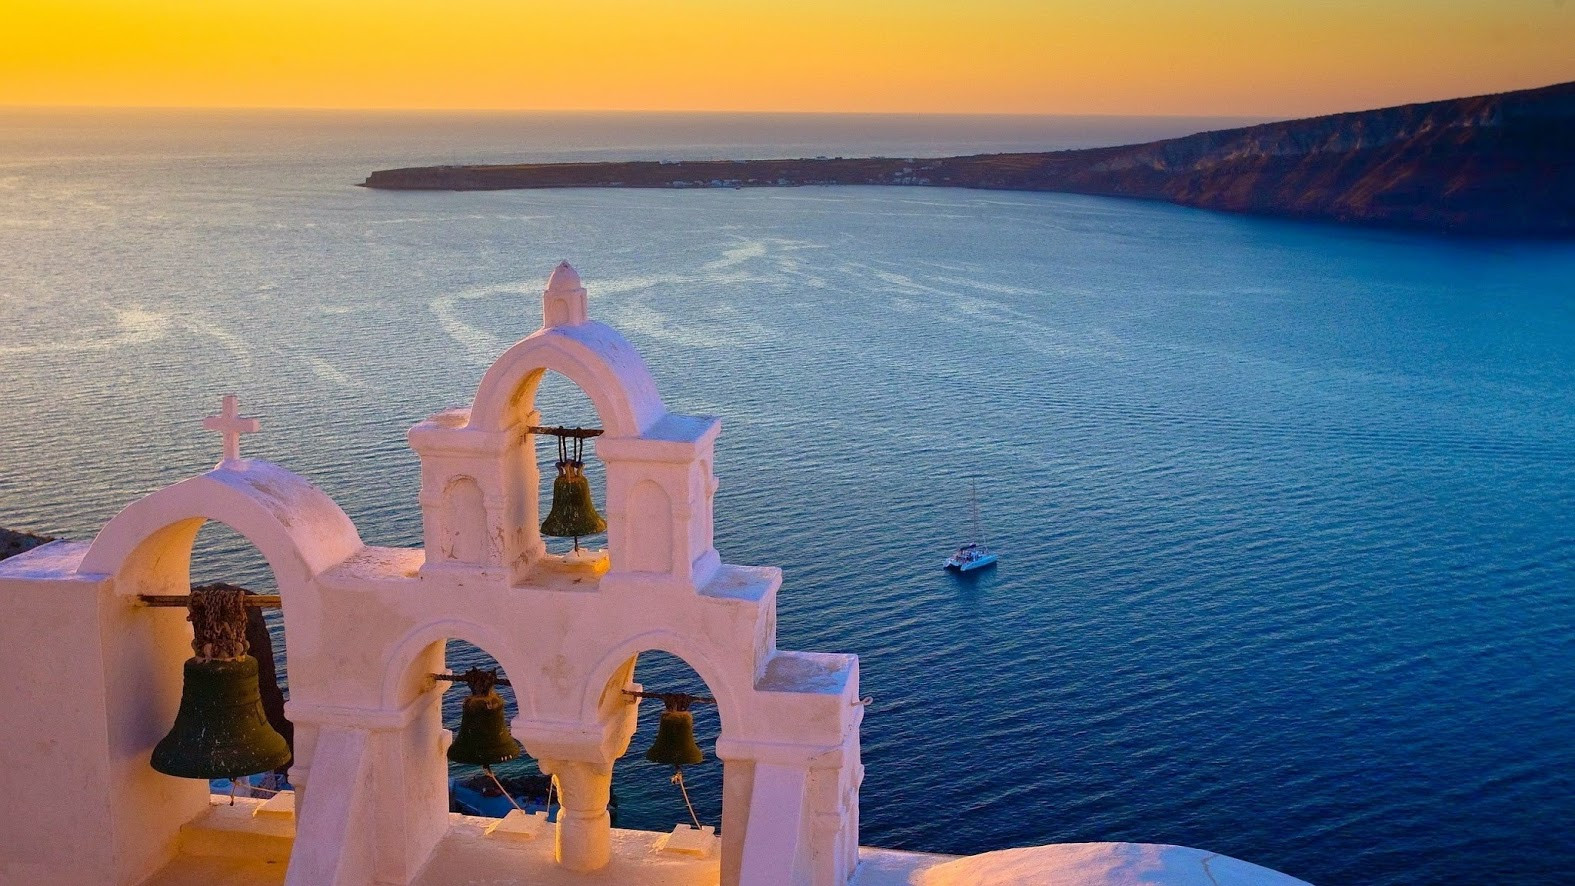 Santorini, Greece - Σαντορίνη, Ελλάδα - Санторини, Греция. Фото Igor Russland